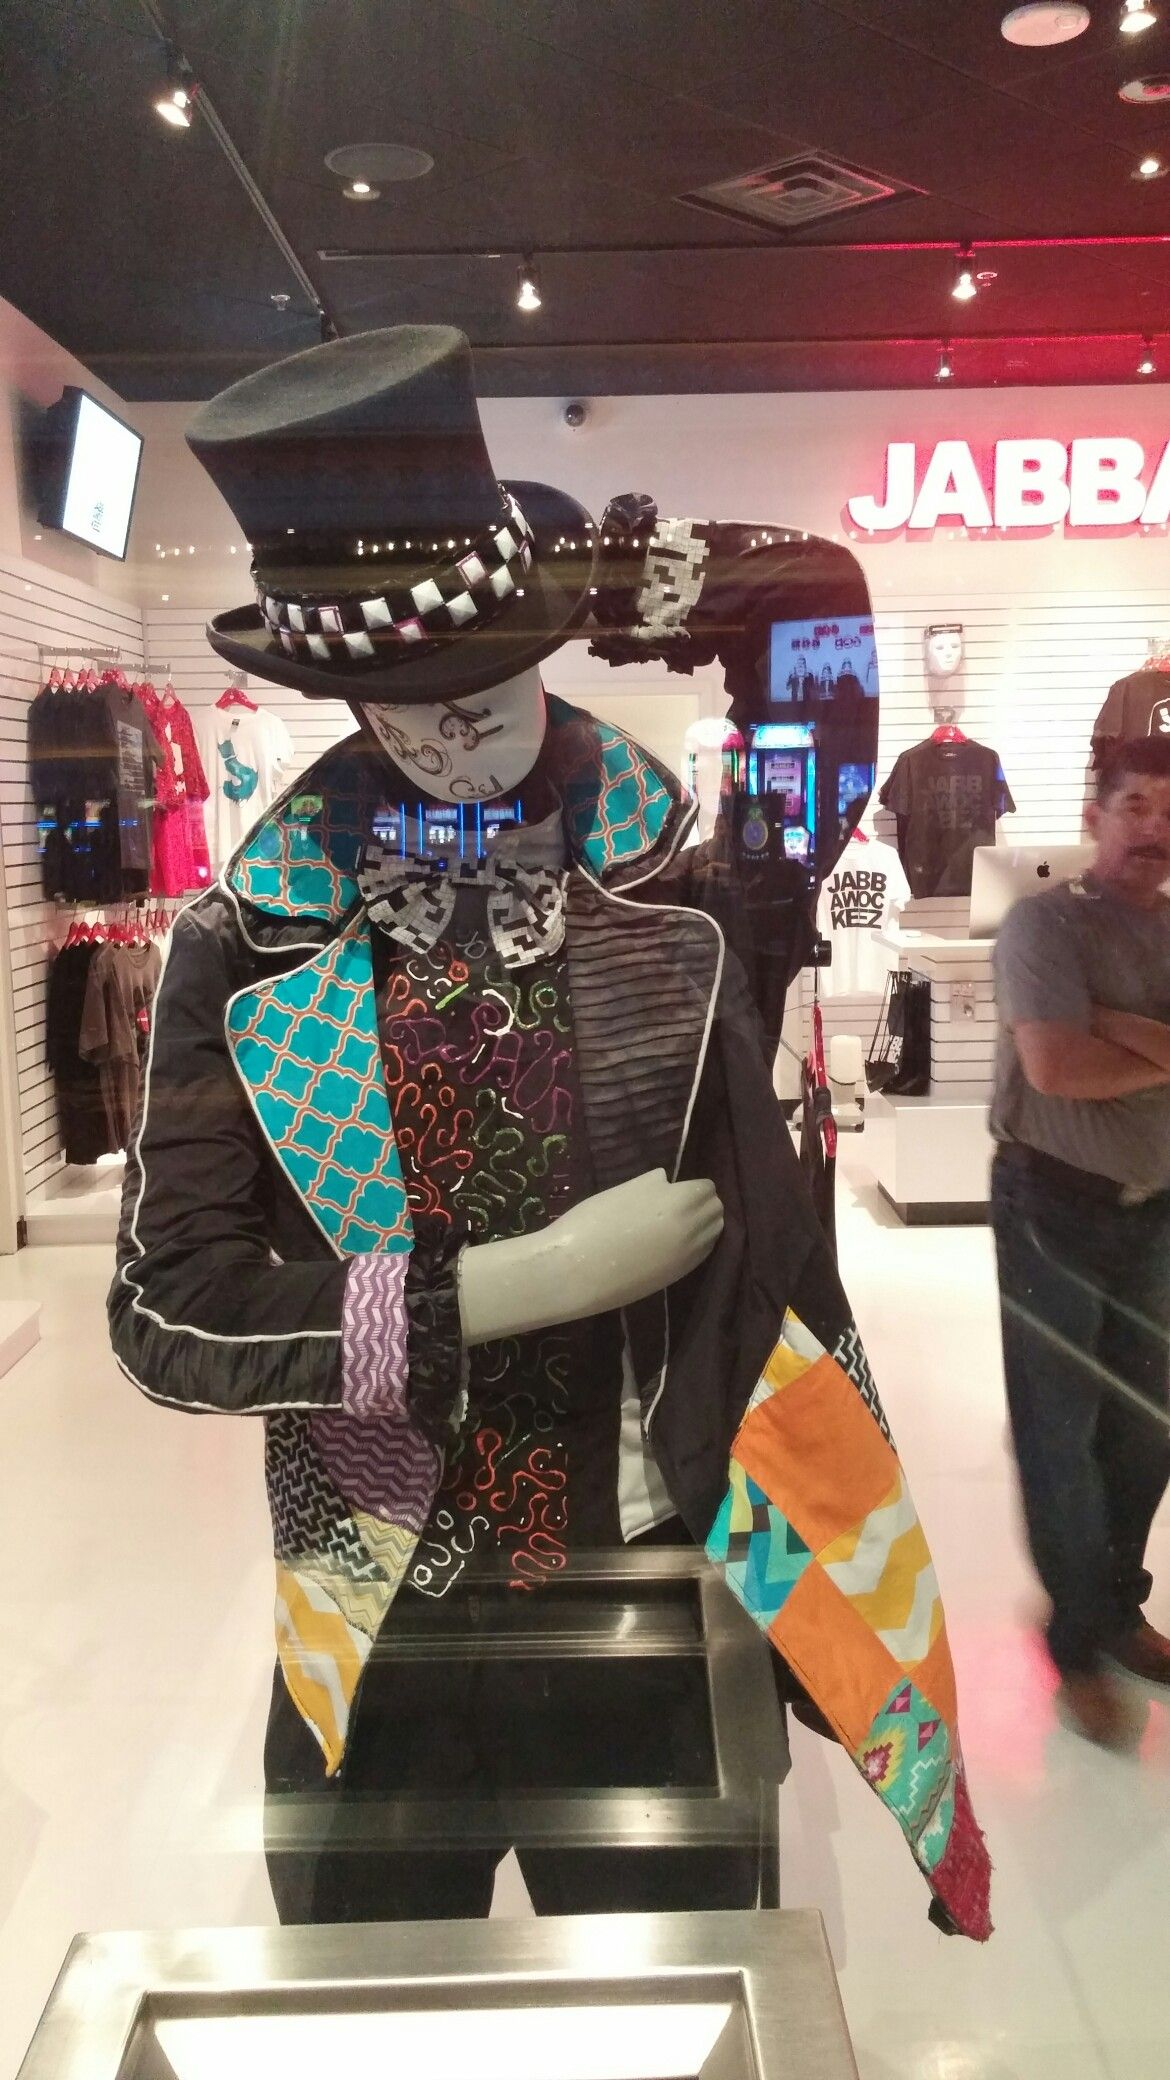 more of the jabbawockeez store, wockshop, at mgm grand, las vegas